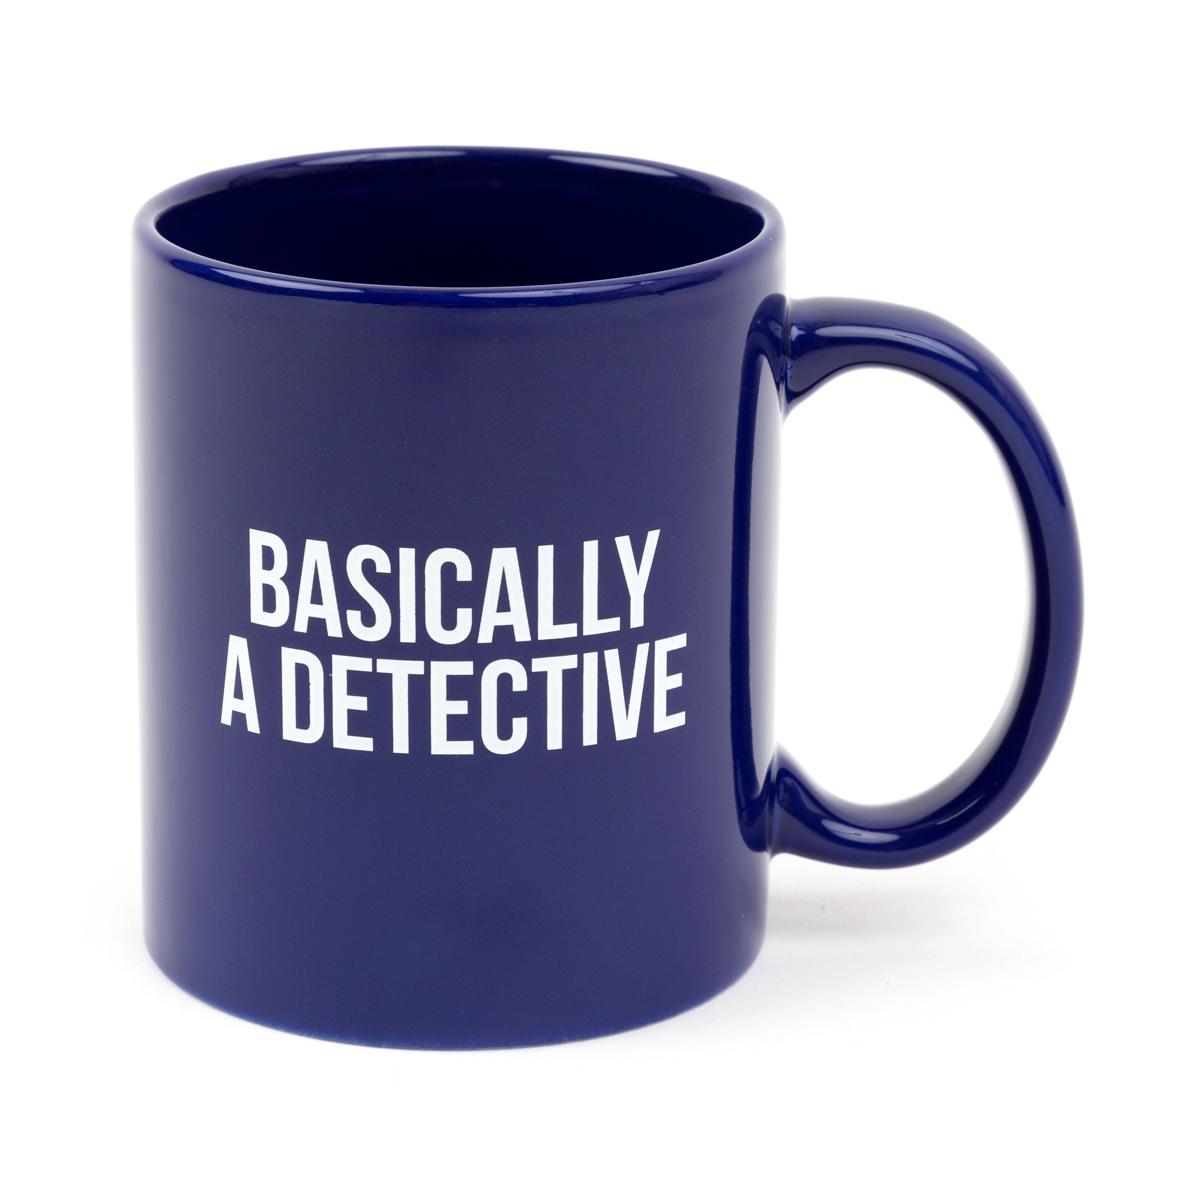 Basically A Detective Mug